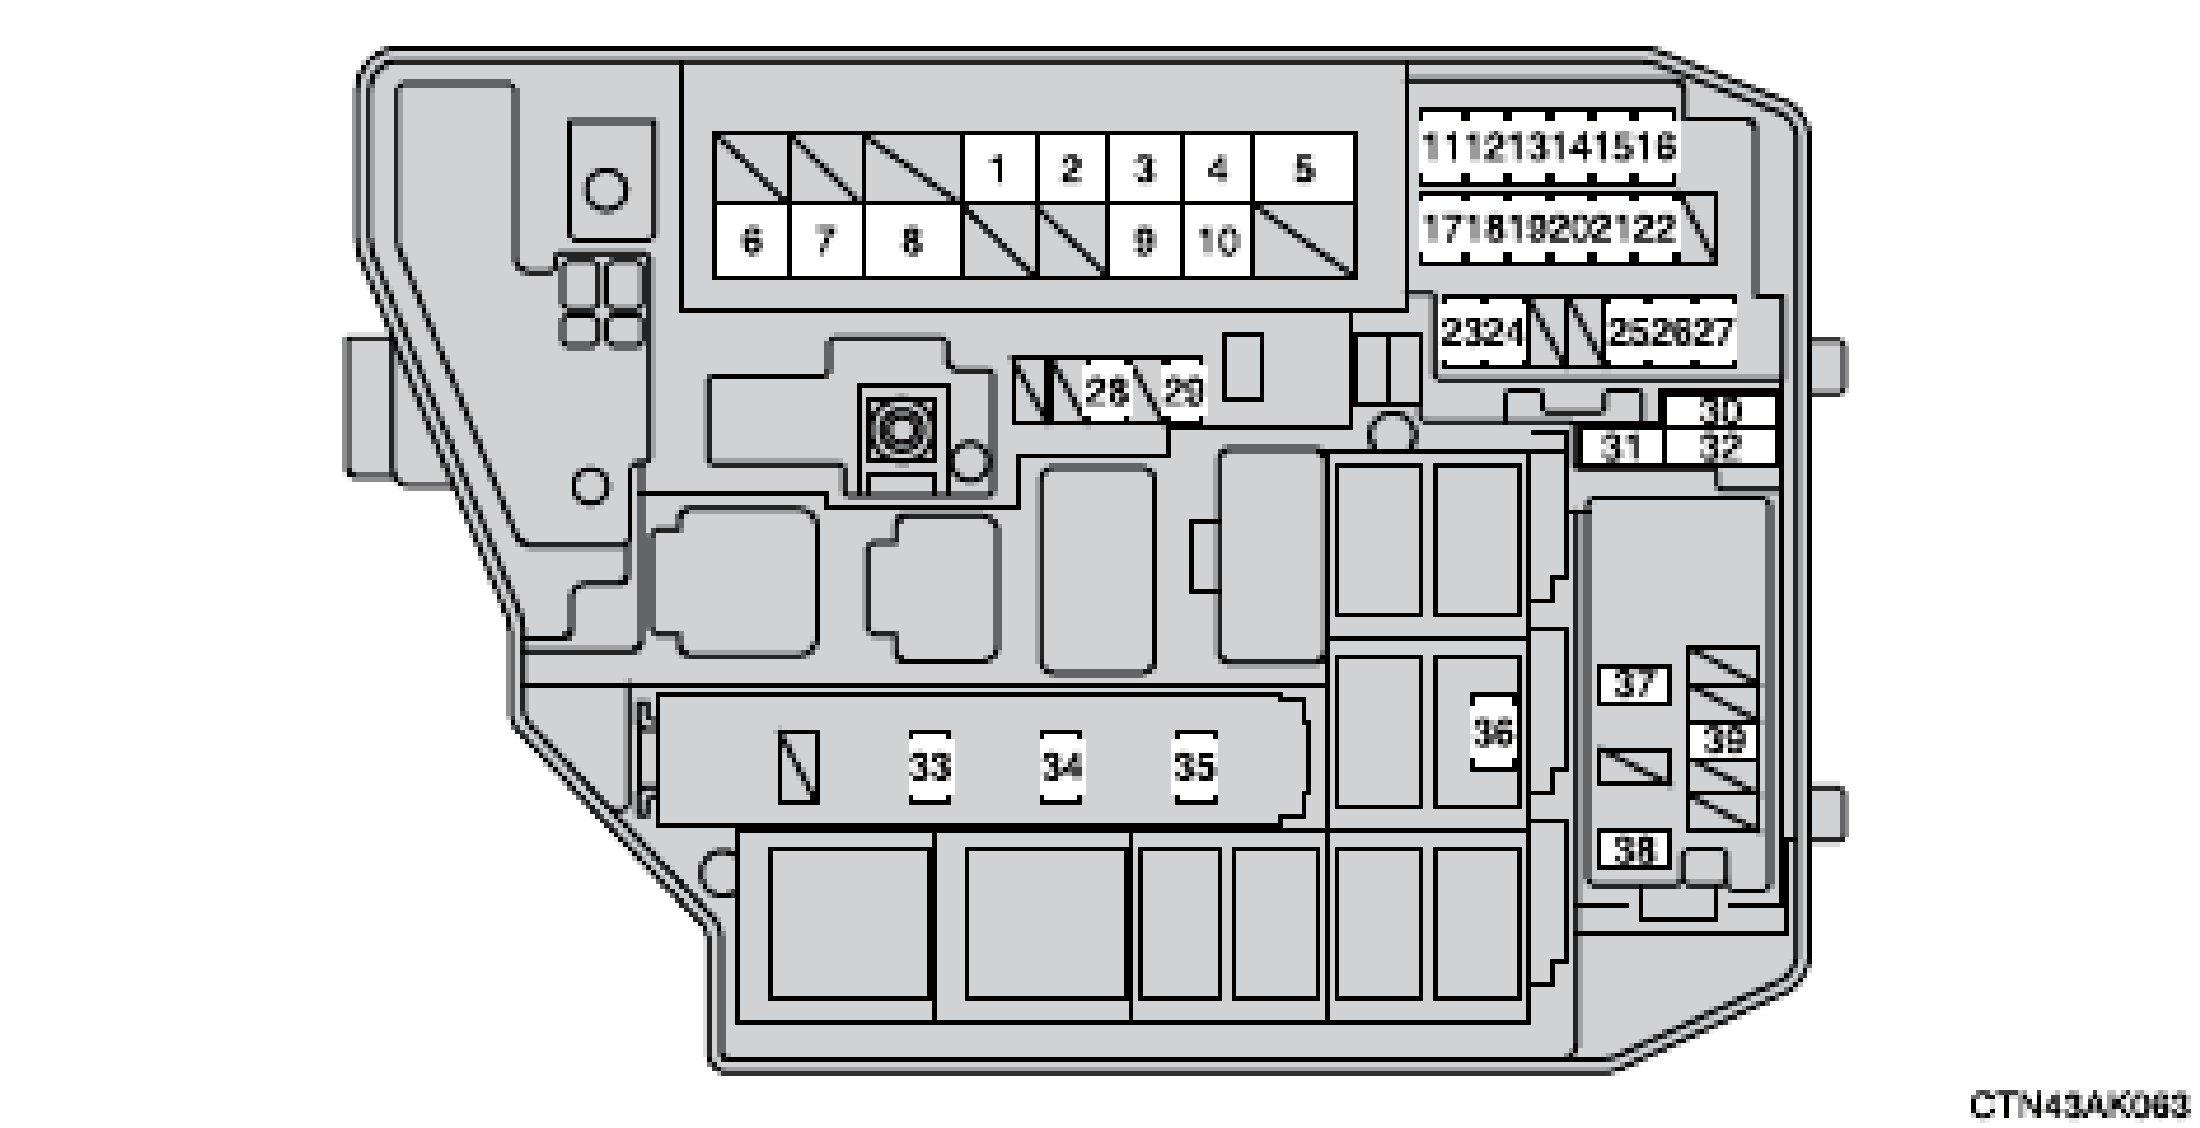 [DVZP_7254]   EB_9772] 89 Toyota Camry Fuse Diagram Download Diagram   2007 Prius Fuse Diagram      Athid Gue45 Apan Alypt Itis Dylit Eatte Mohammedshrine Librar Wiring 101